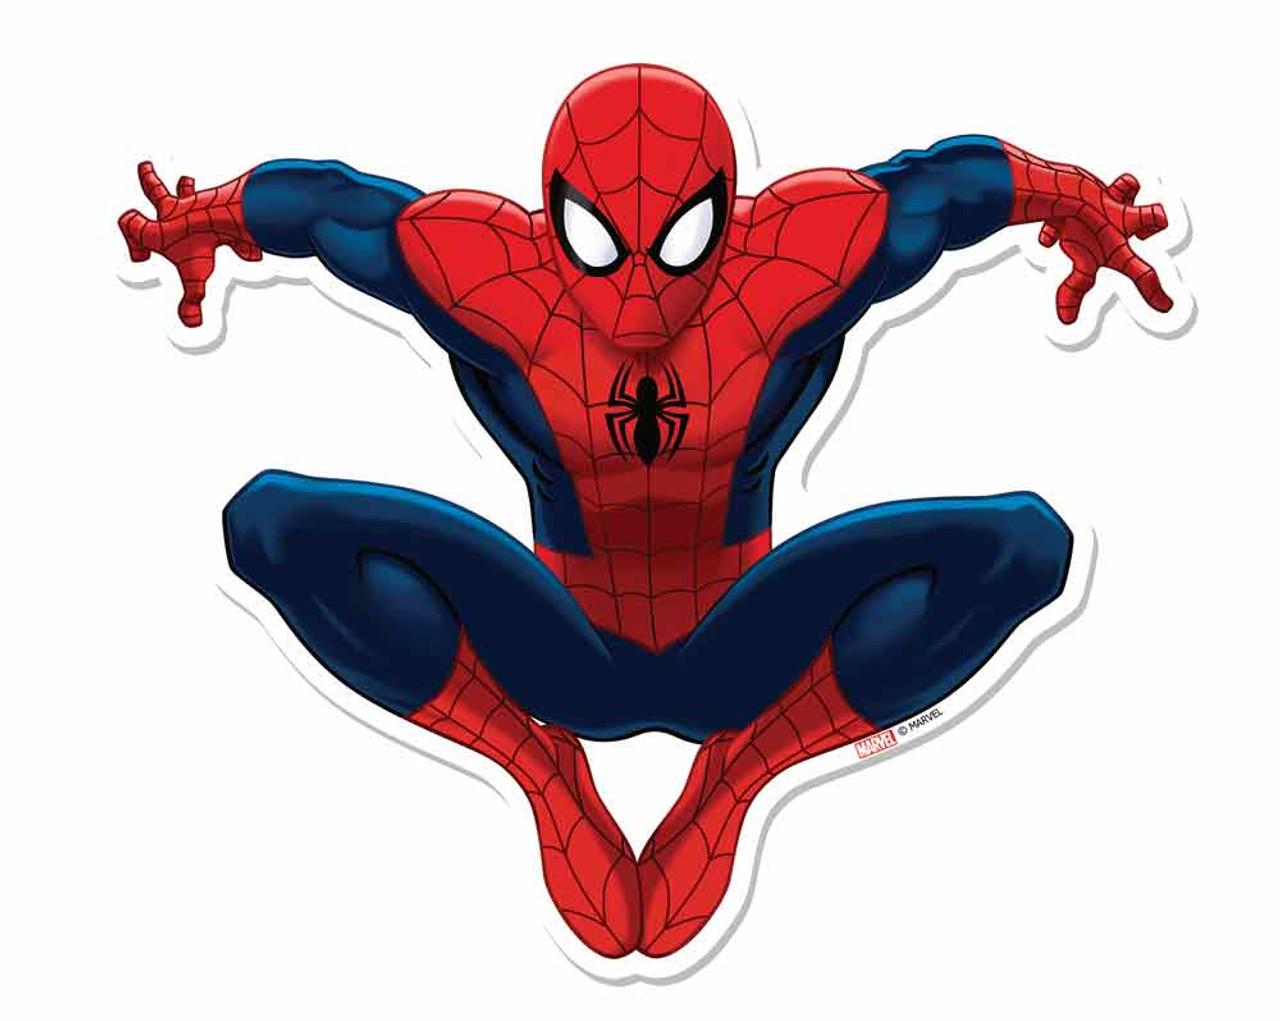 Spider Man 3d Effect Marvel Pop Out Cardboard Cutout Wall